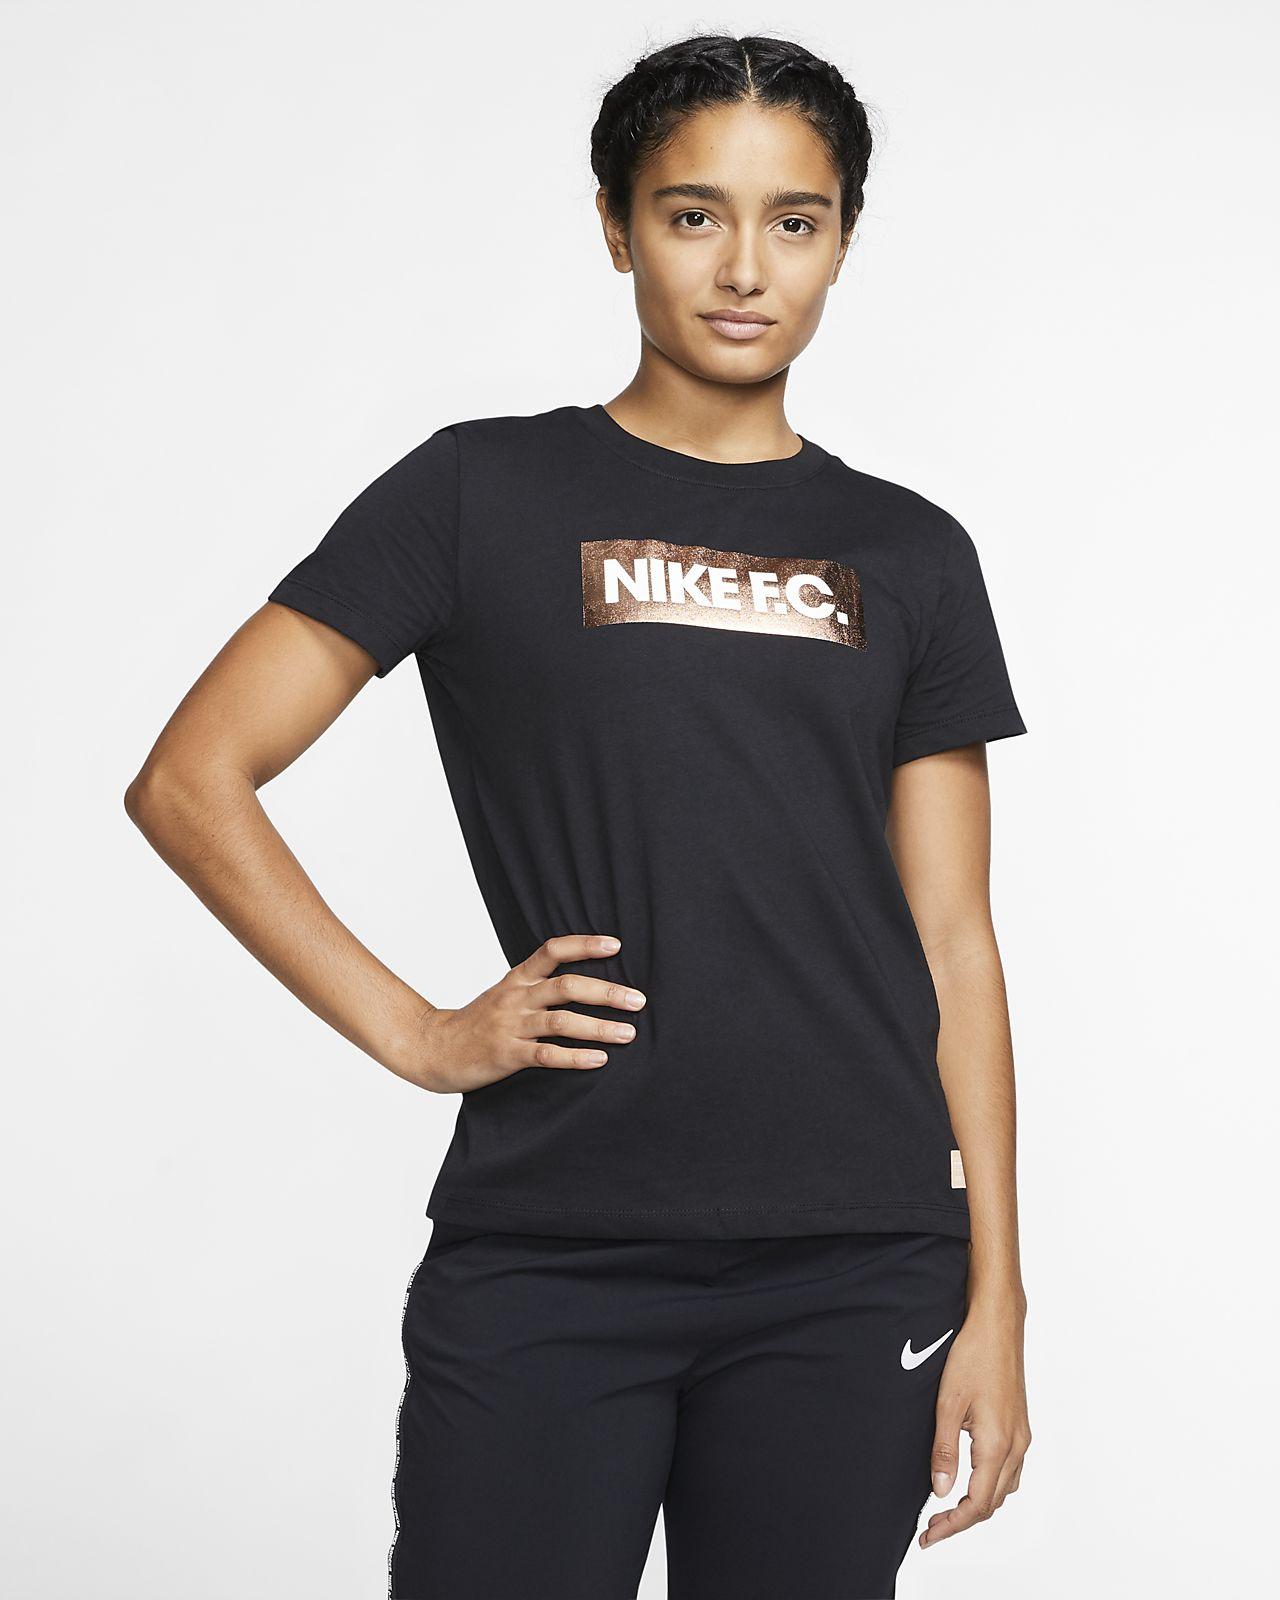 Nike F.C. Women's Football T-Shirt